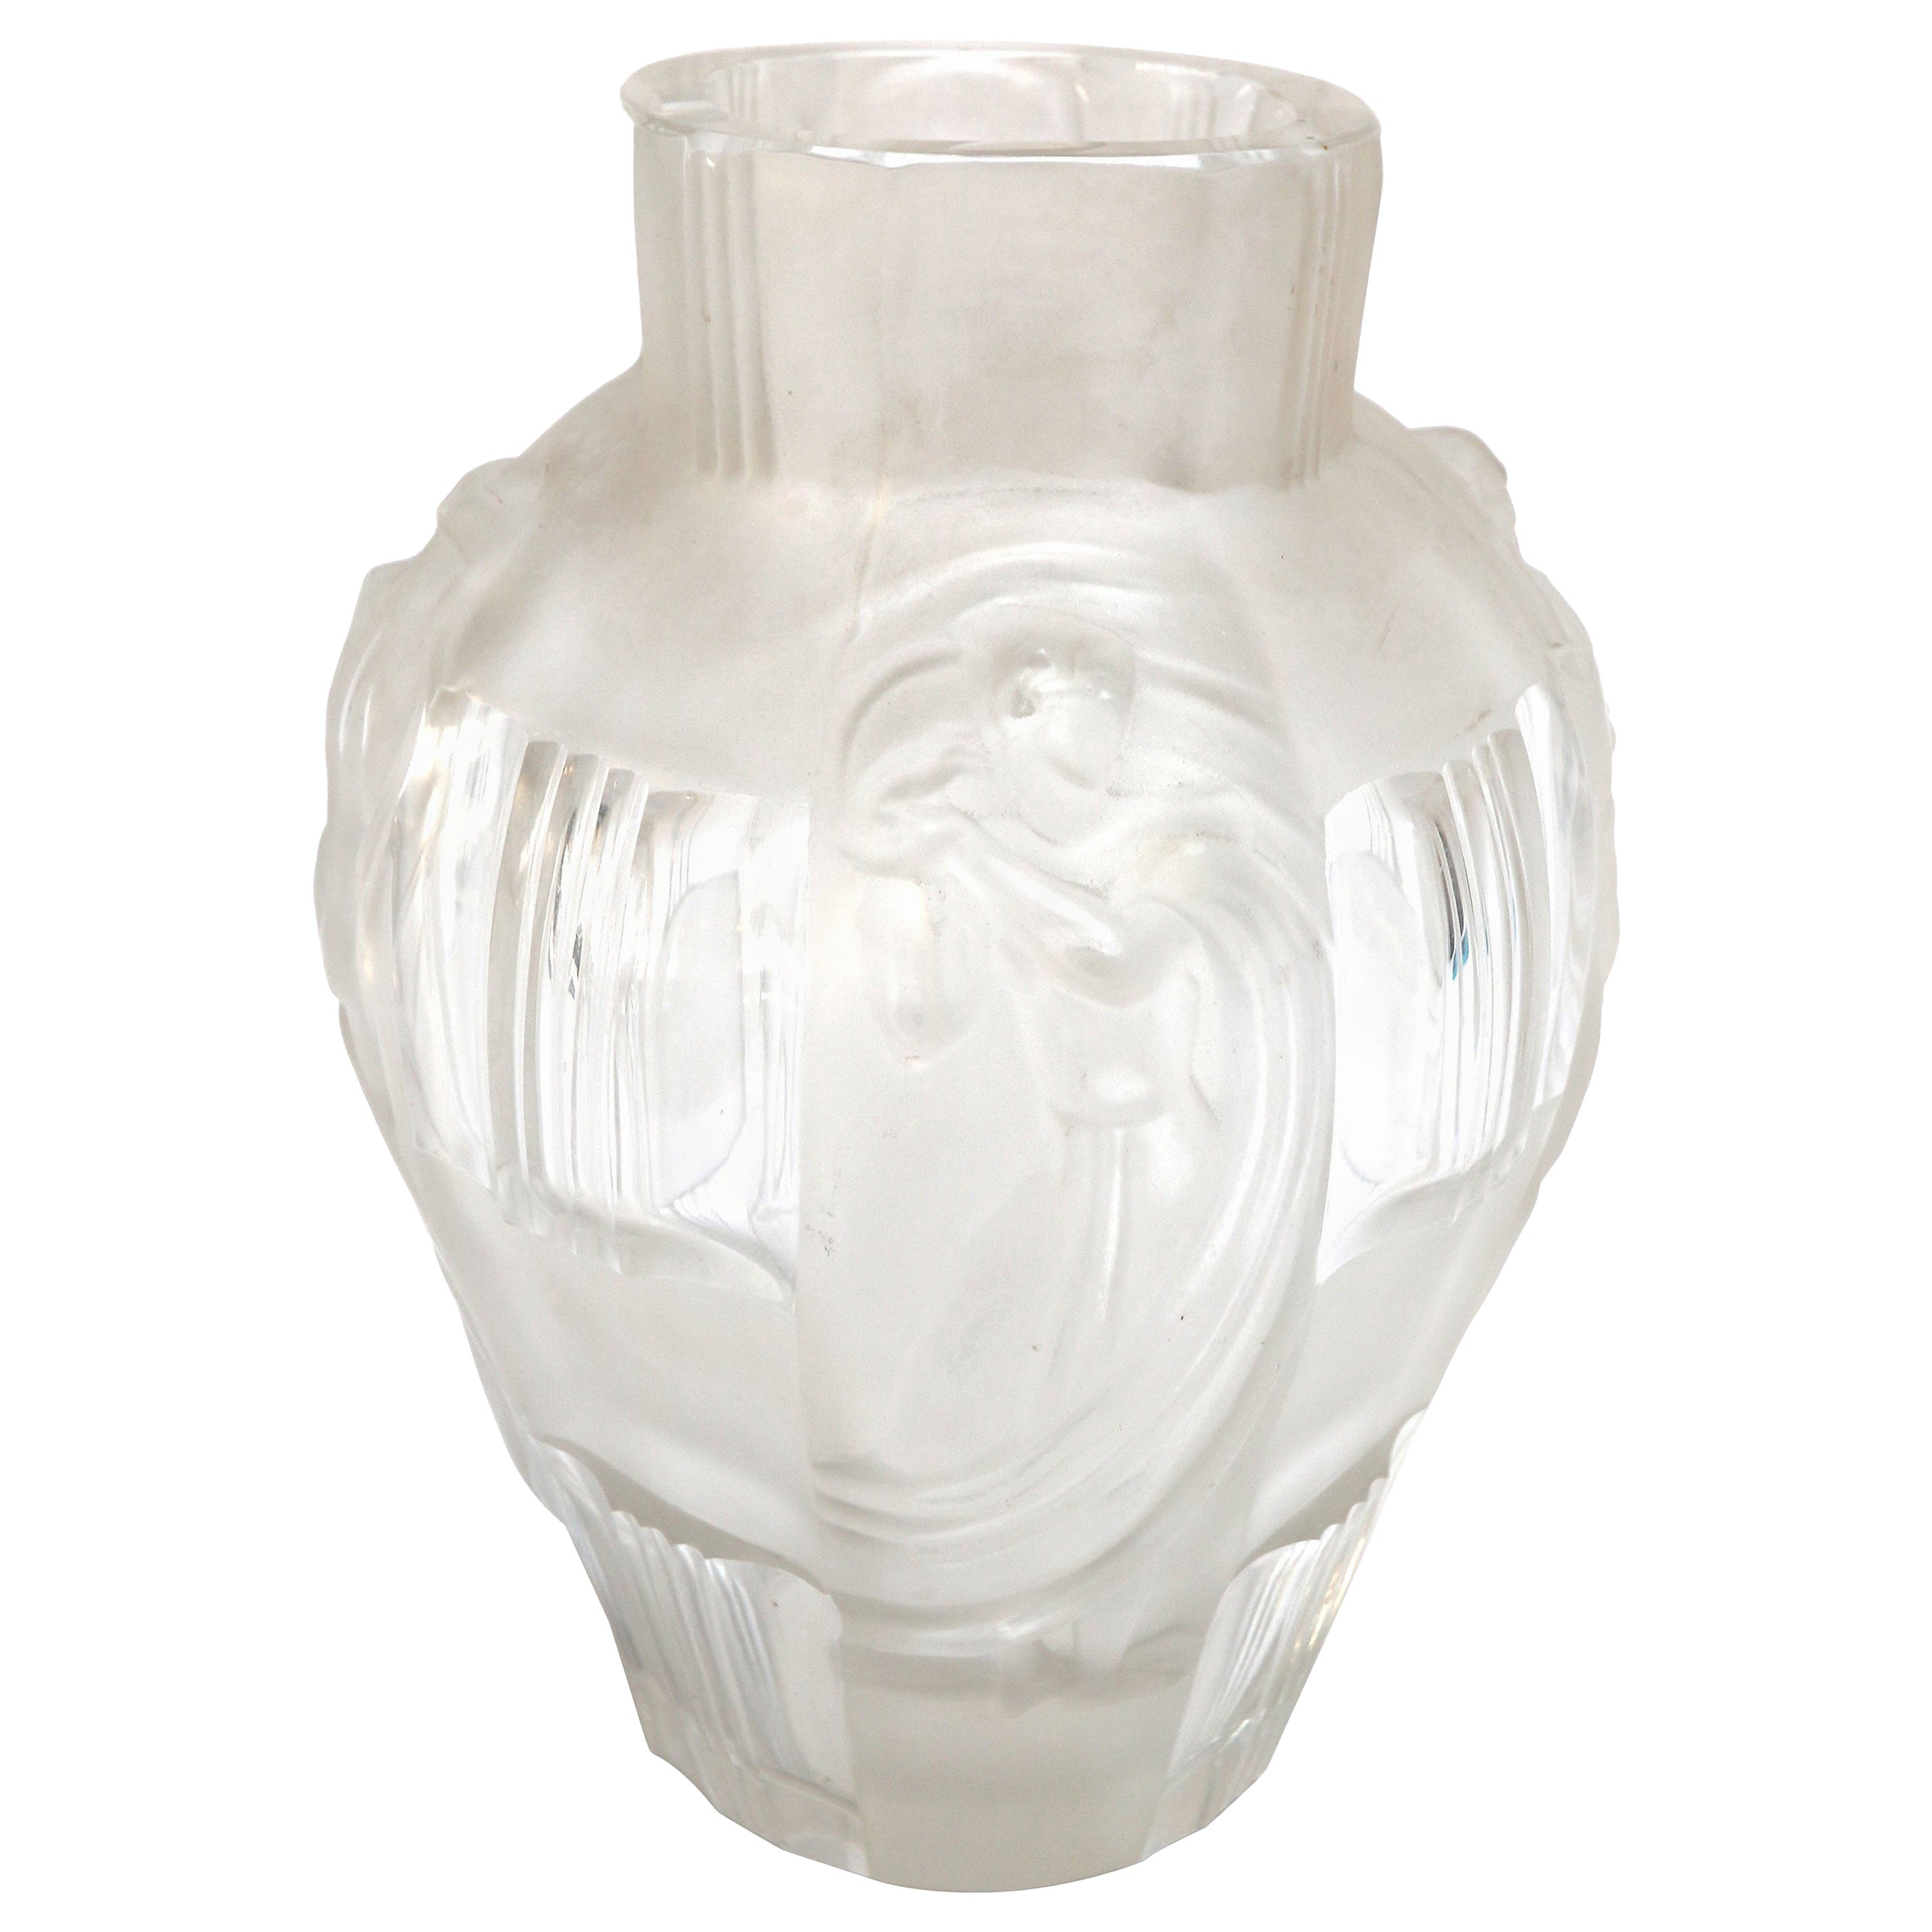 Art Deco Ingrid Glass Vase with Female Figures by Curt Schlevogt, 1930s